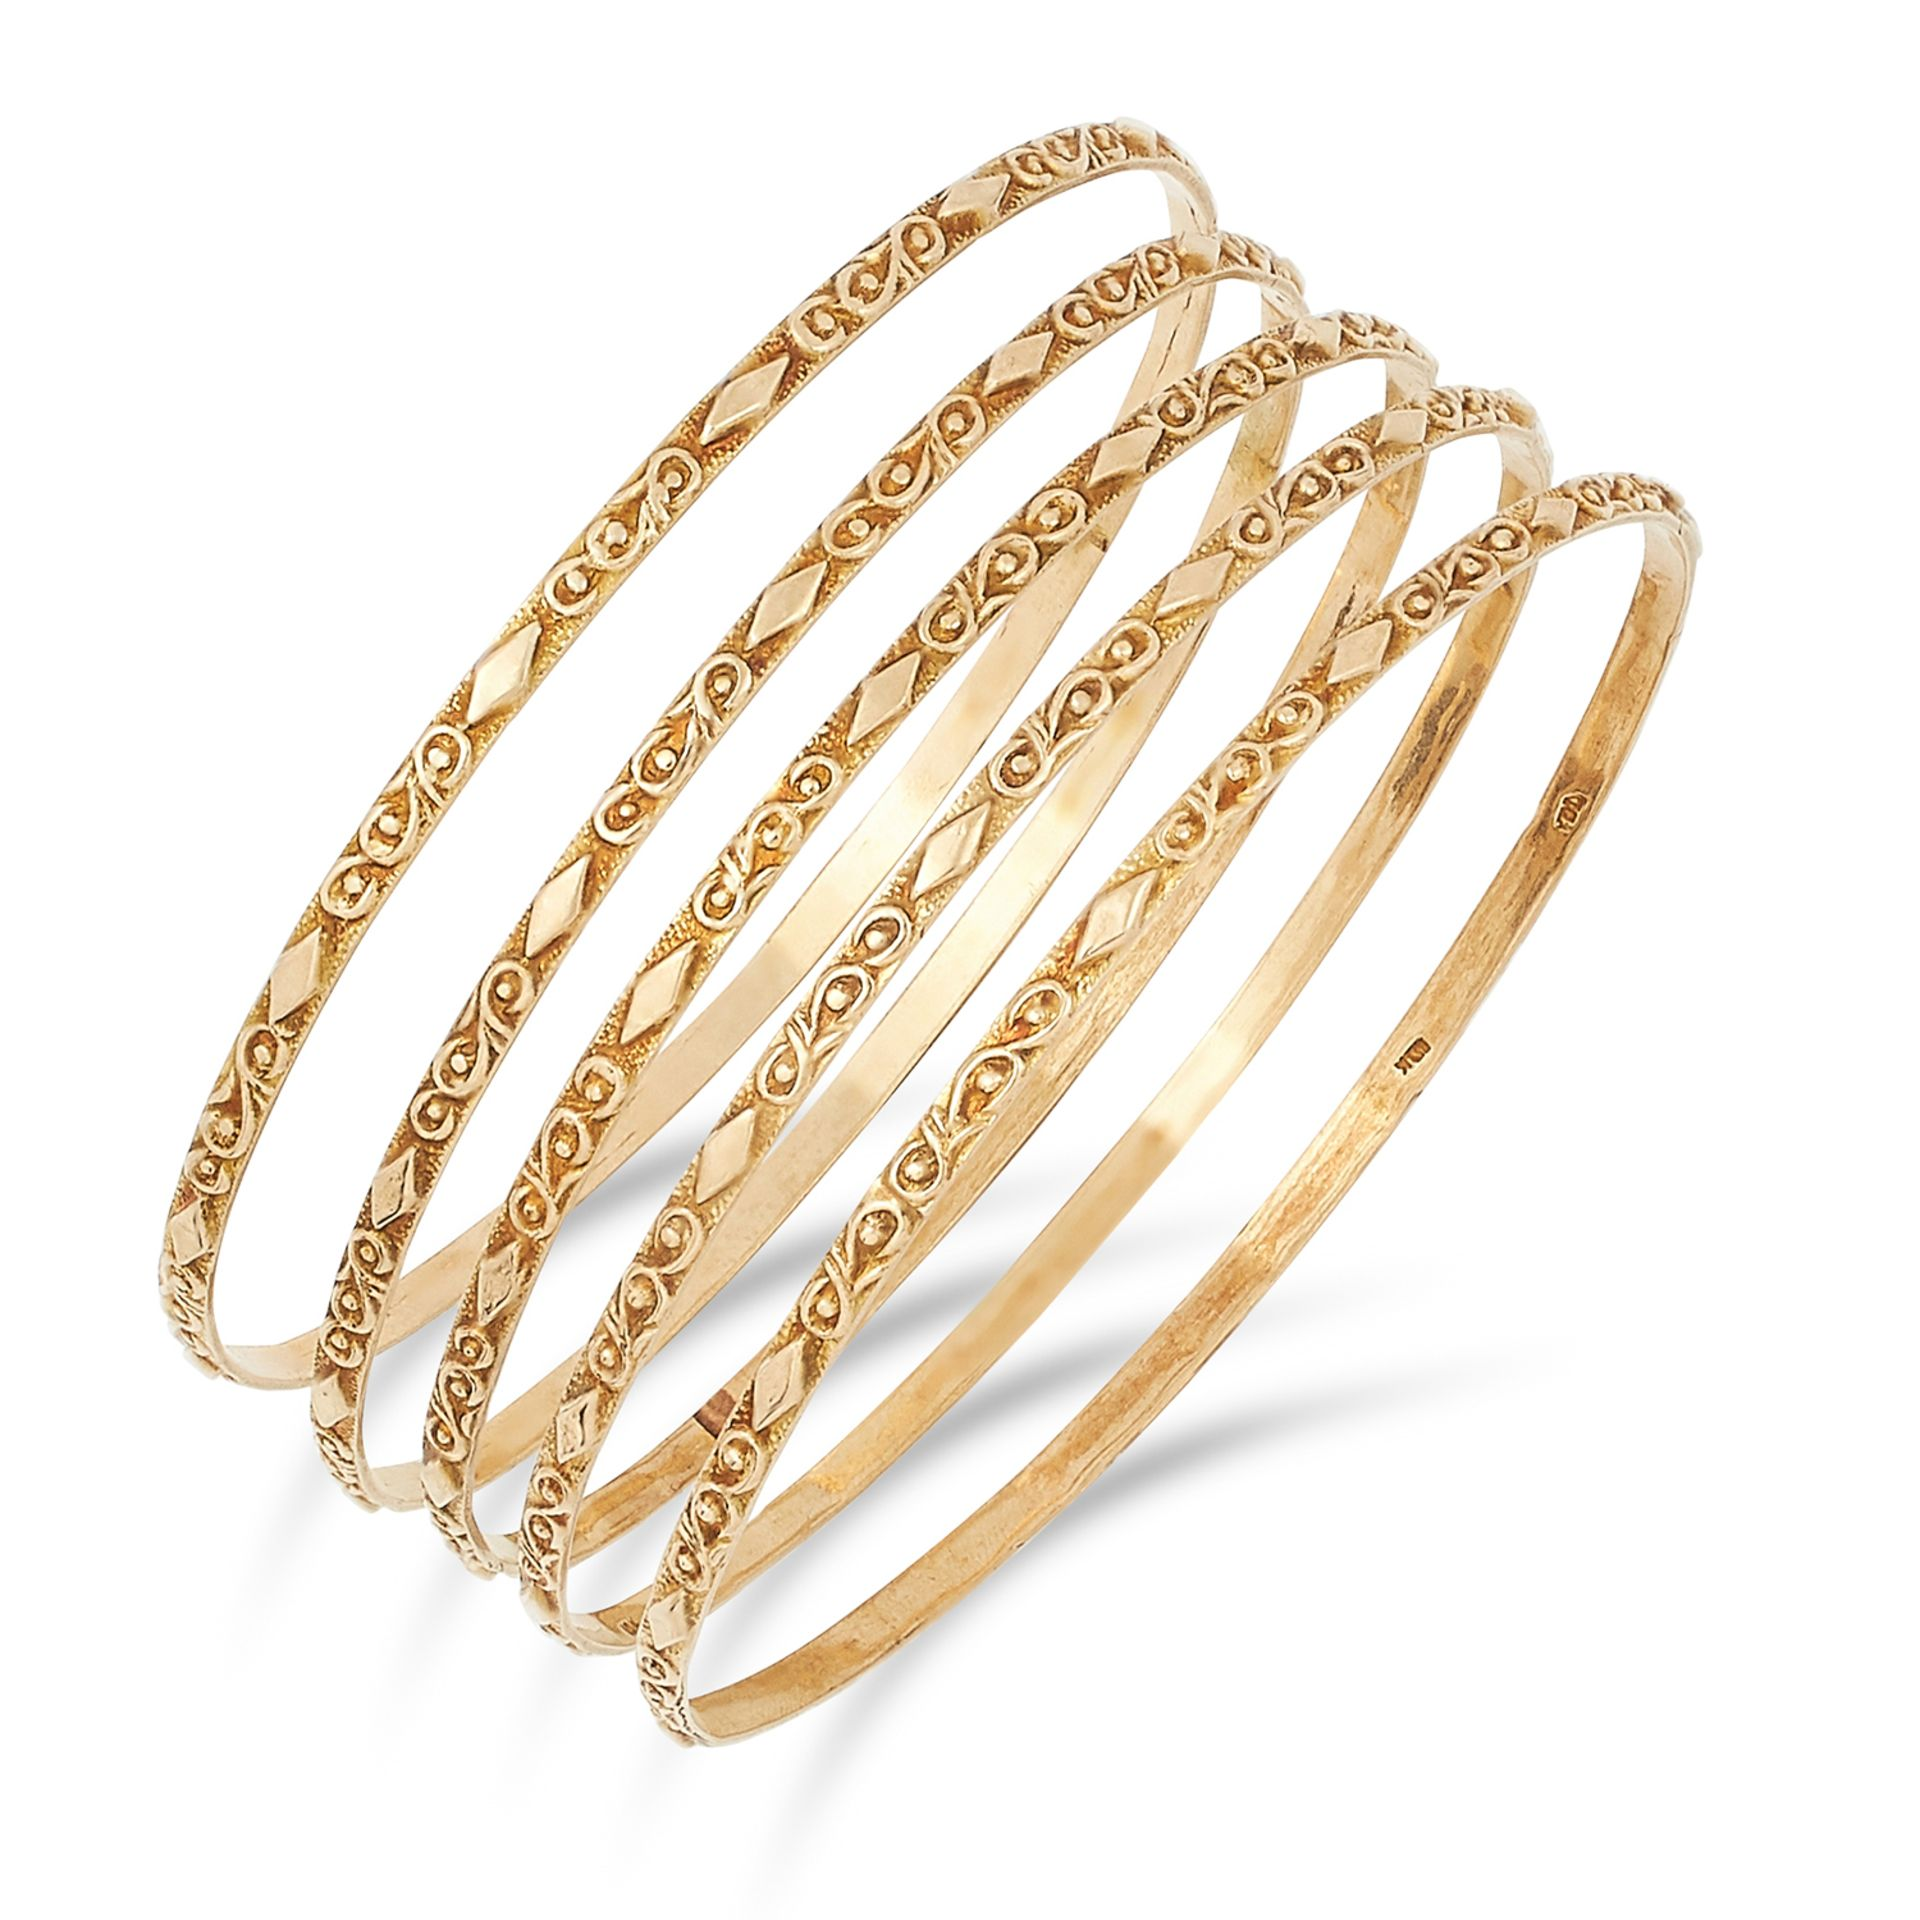 FIVE GOLD BANGLES, with textured design, inner diameter: 6.5cm, 24.7g.